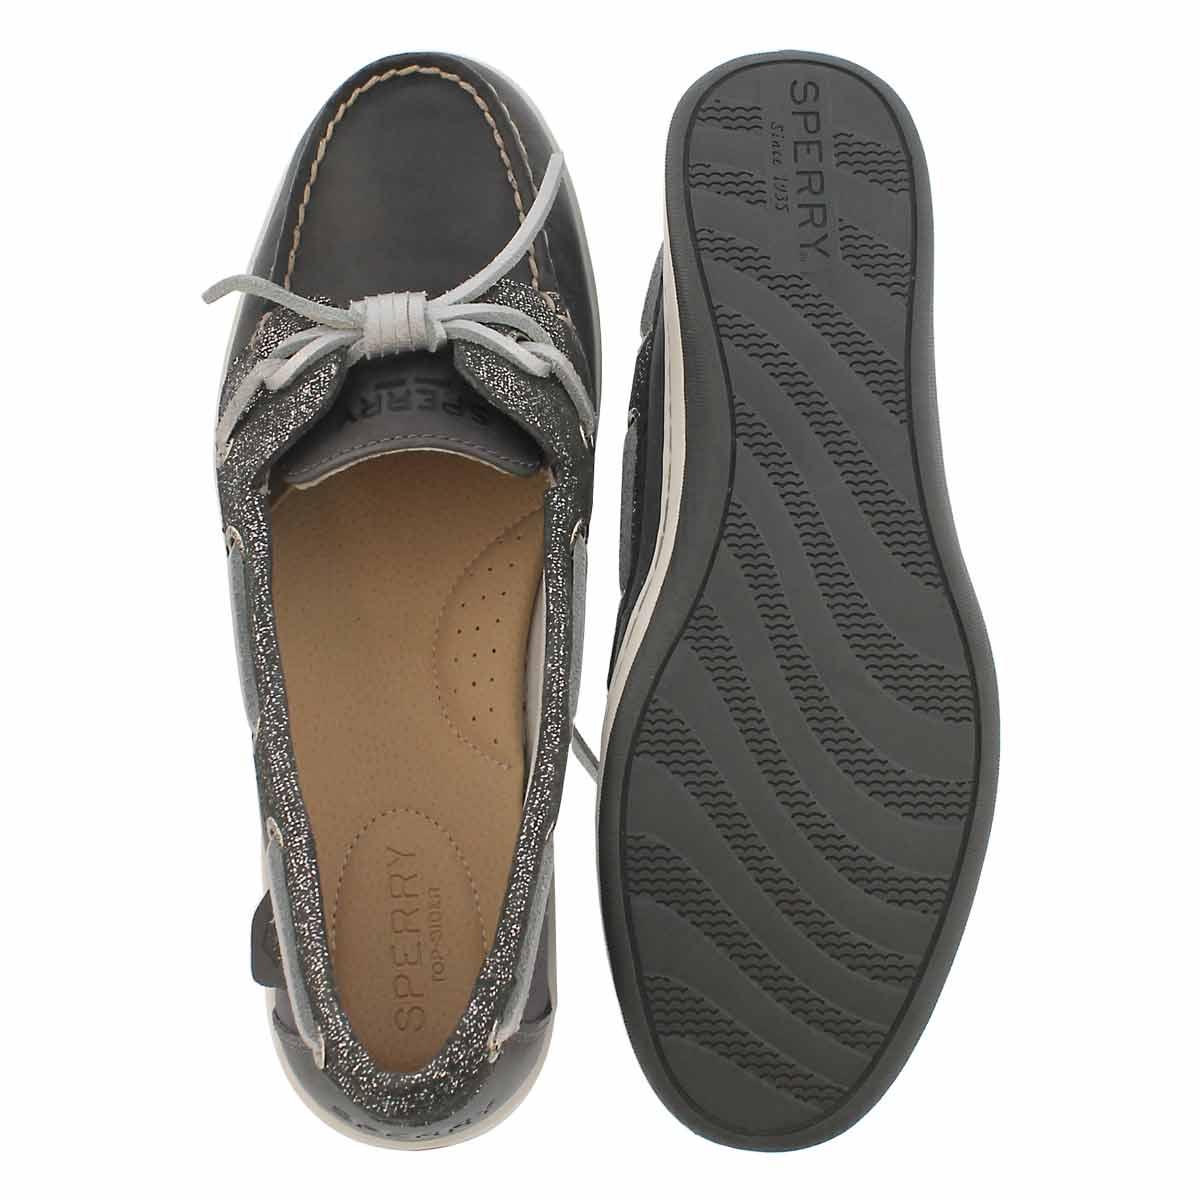 Lds Barrel Fish 2-eye ashphalt boat shoe